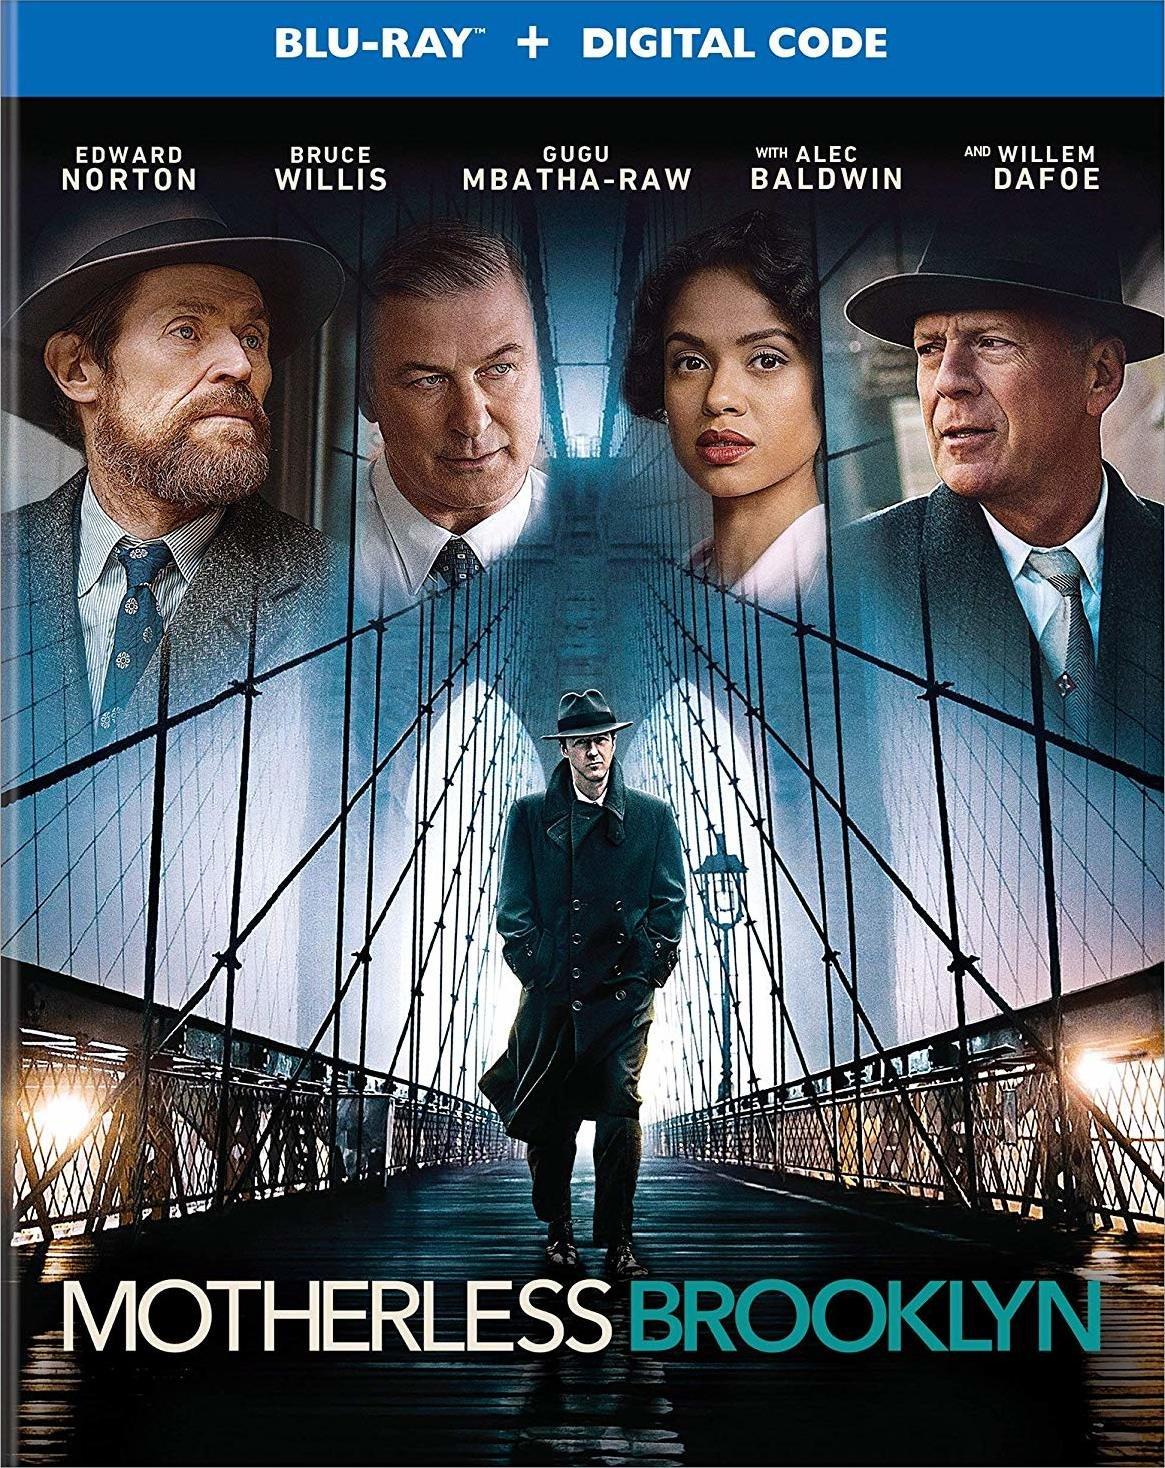 Motherless Brooklyn (2019) poster image